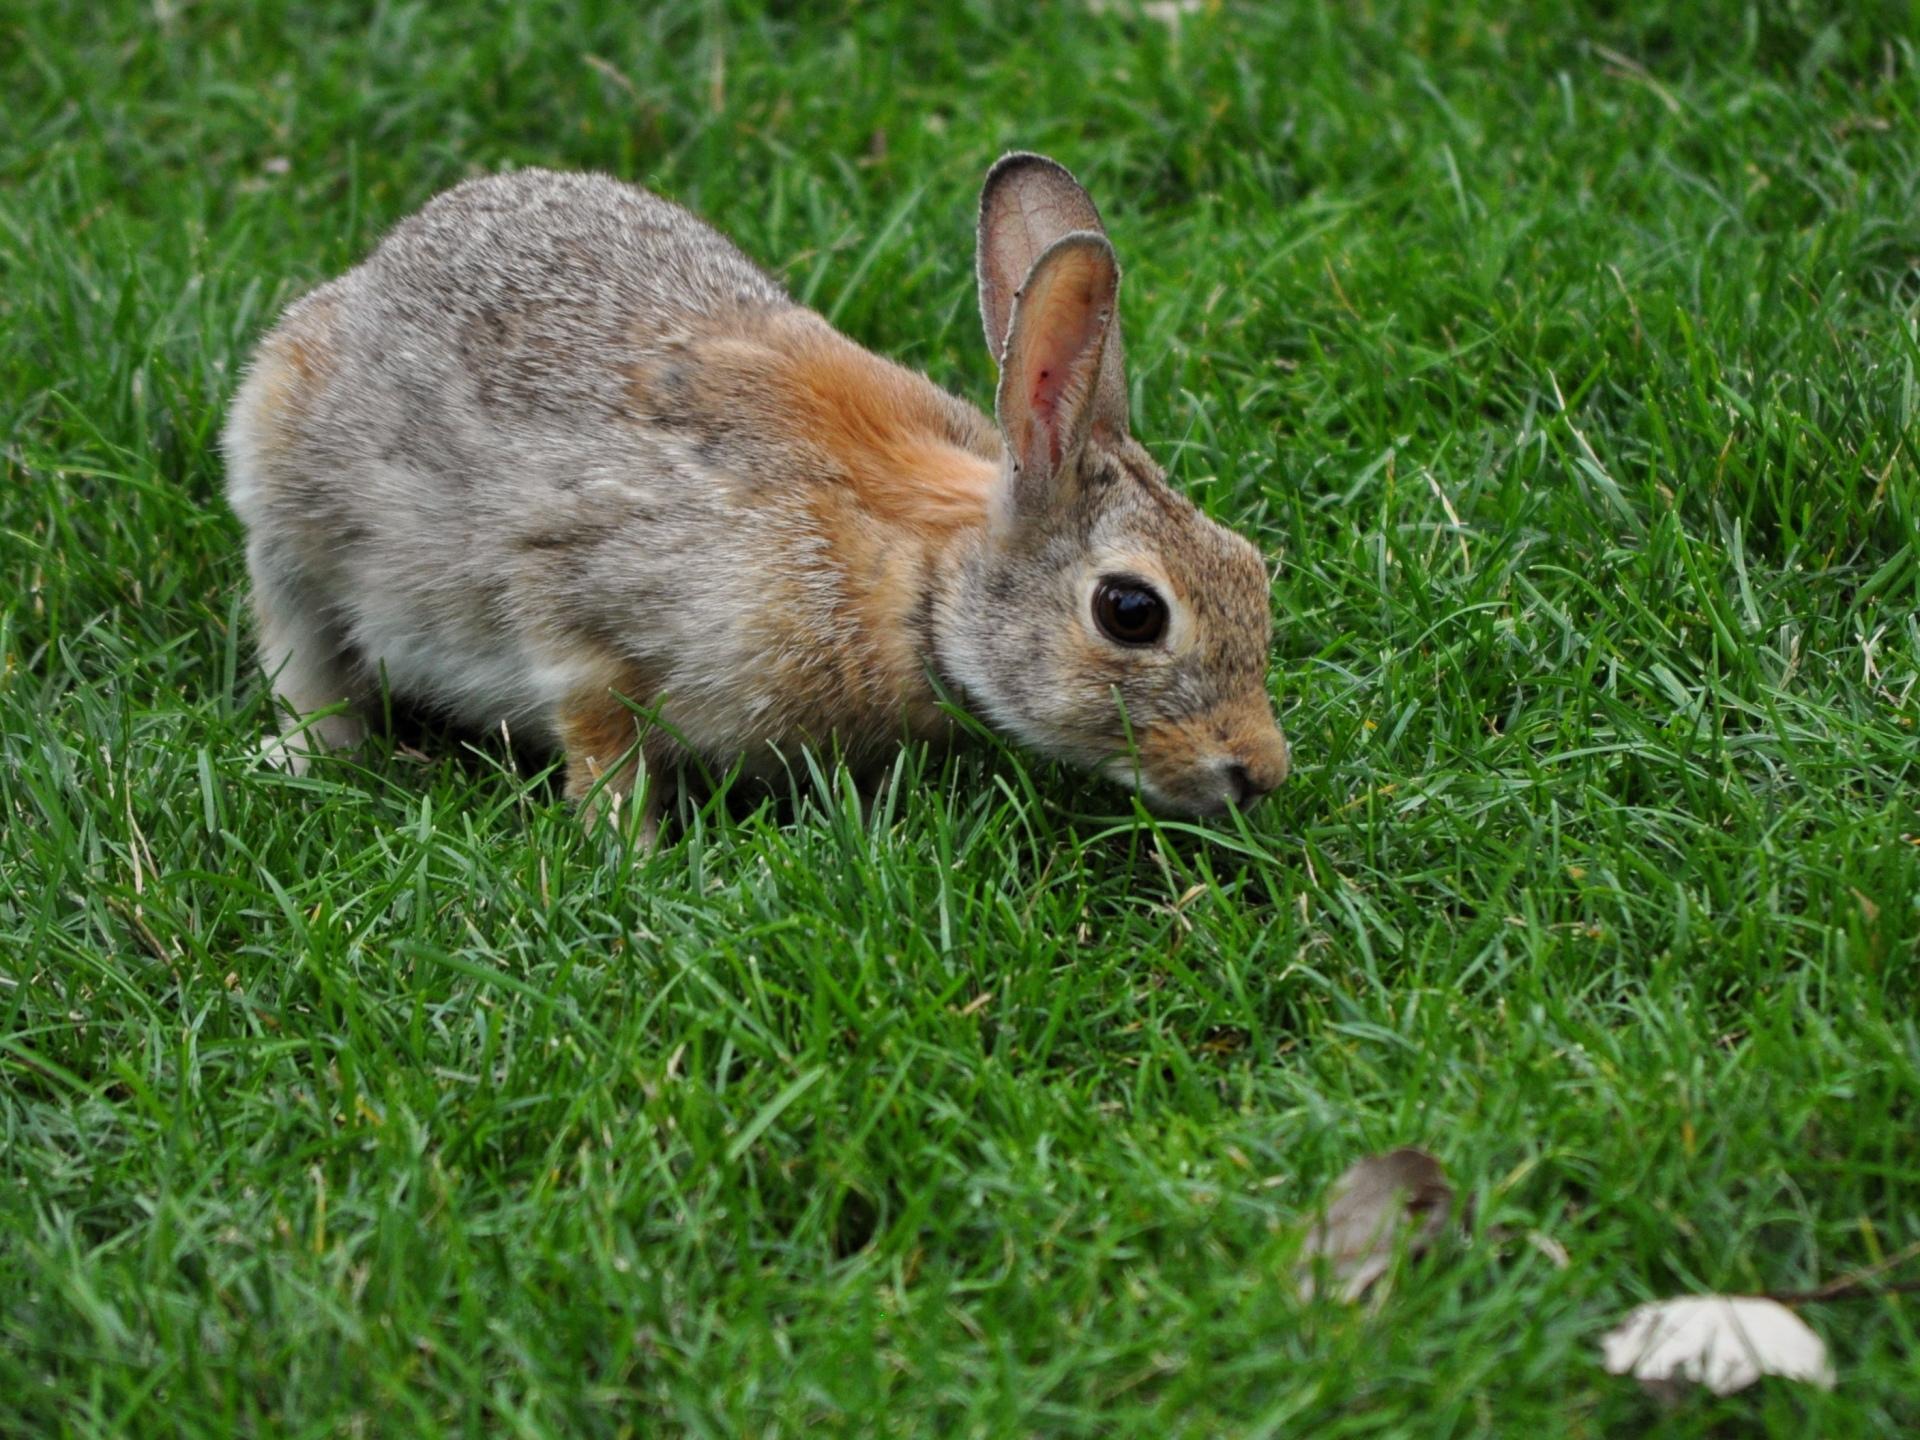 hare wallpaper,rabbit,mammal,domestic rabbit,vertebrate,rabbits and hares